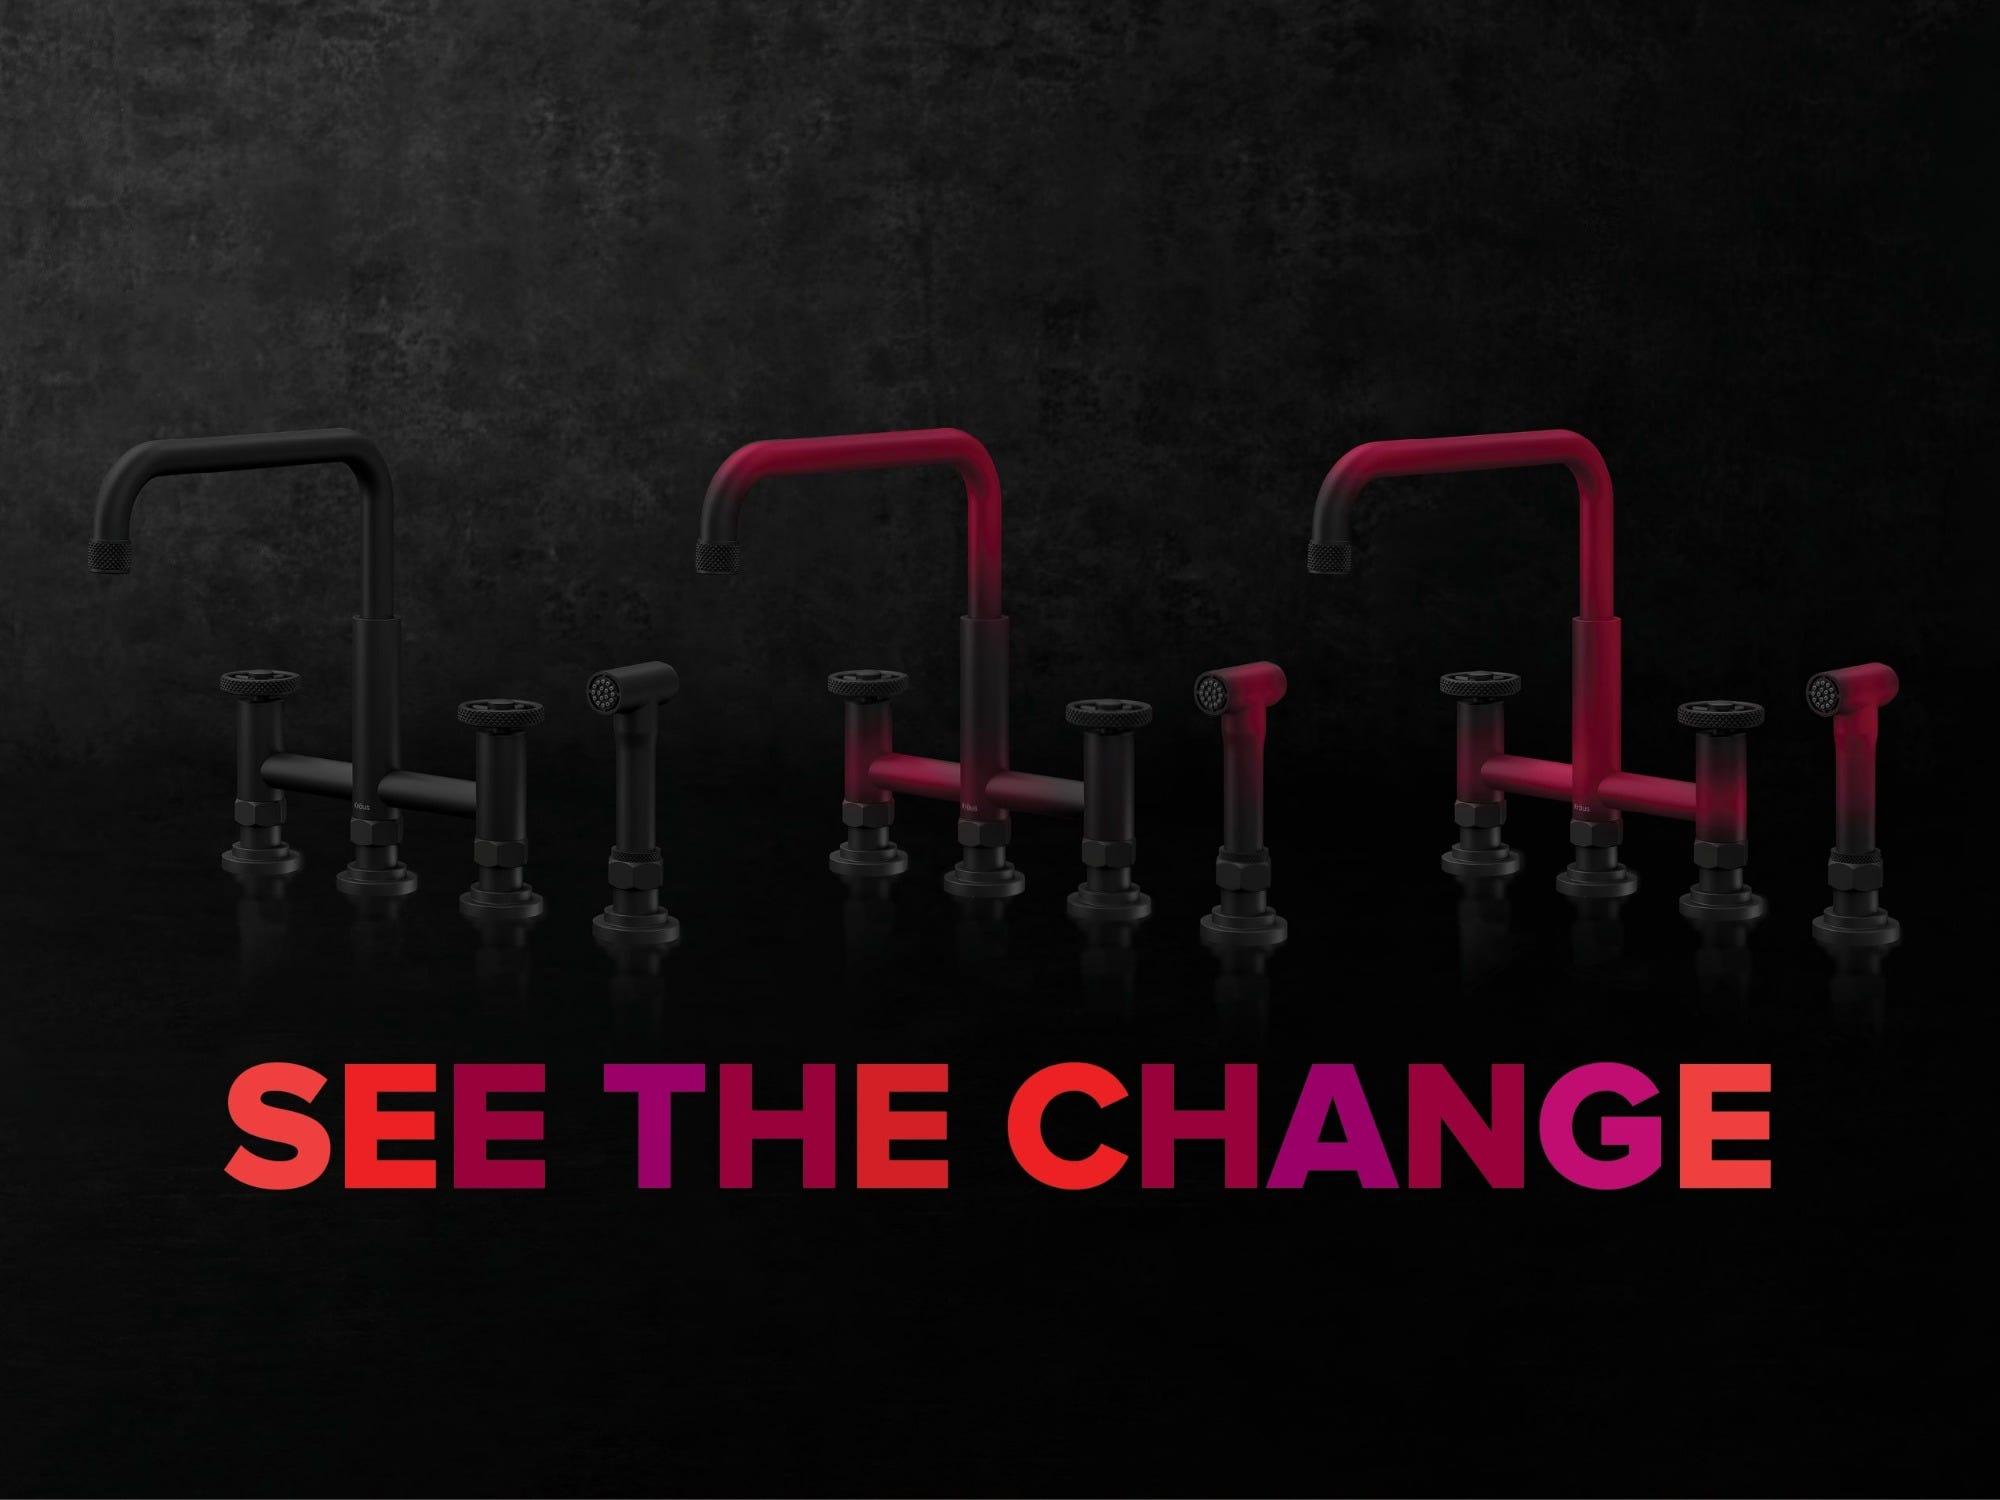 Kraus Color Changing Faucet at KBIS 2020